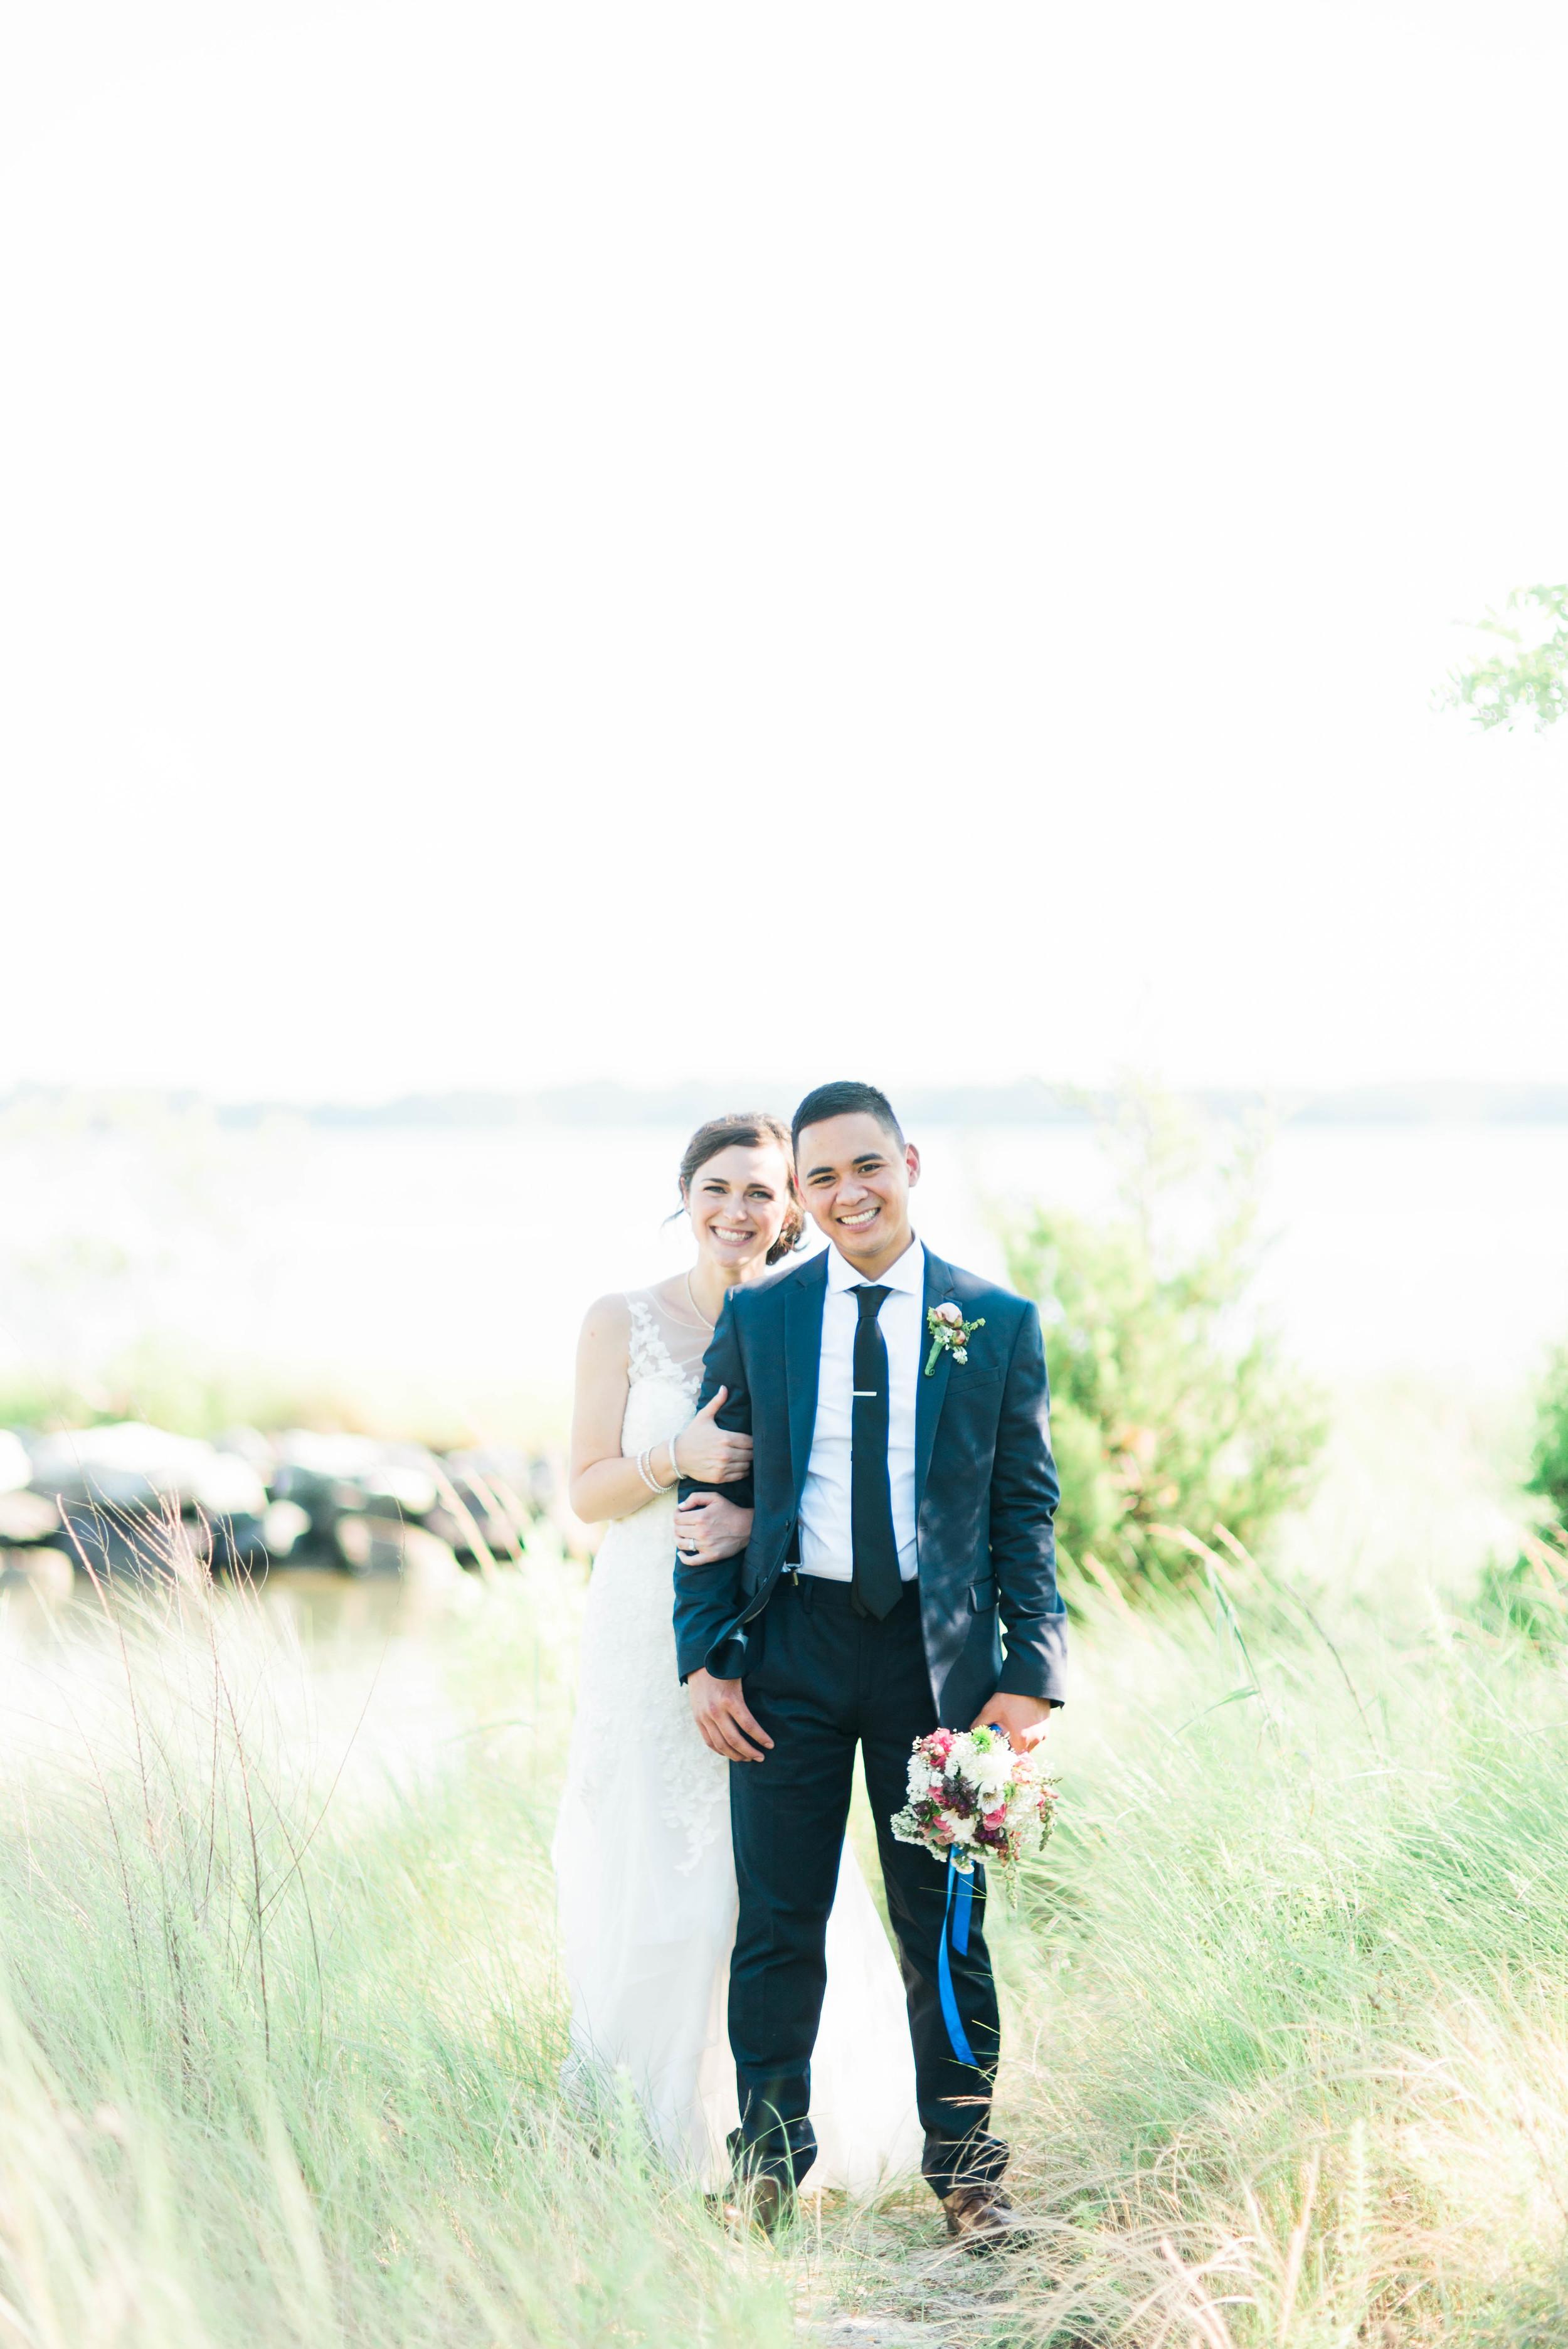 PREVIEWremowedding2016-50.jpg